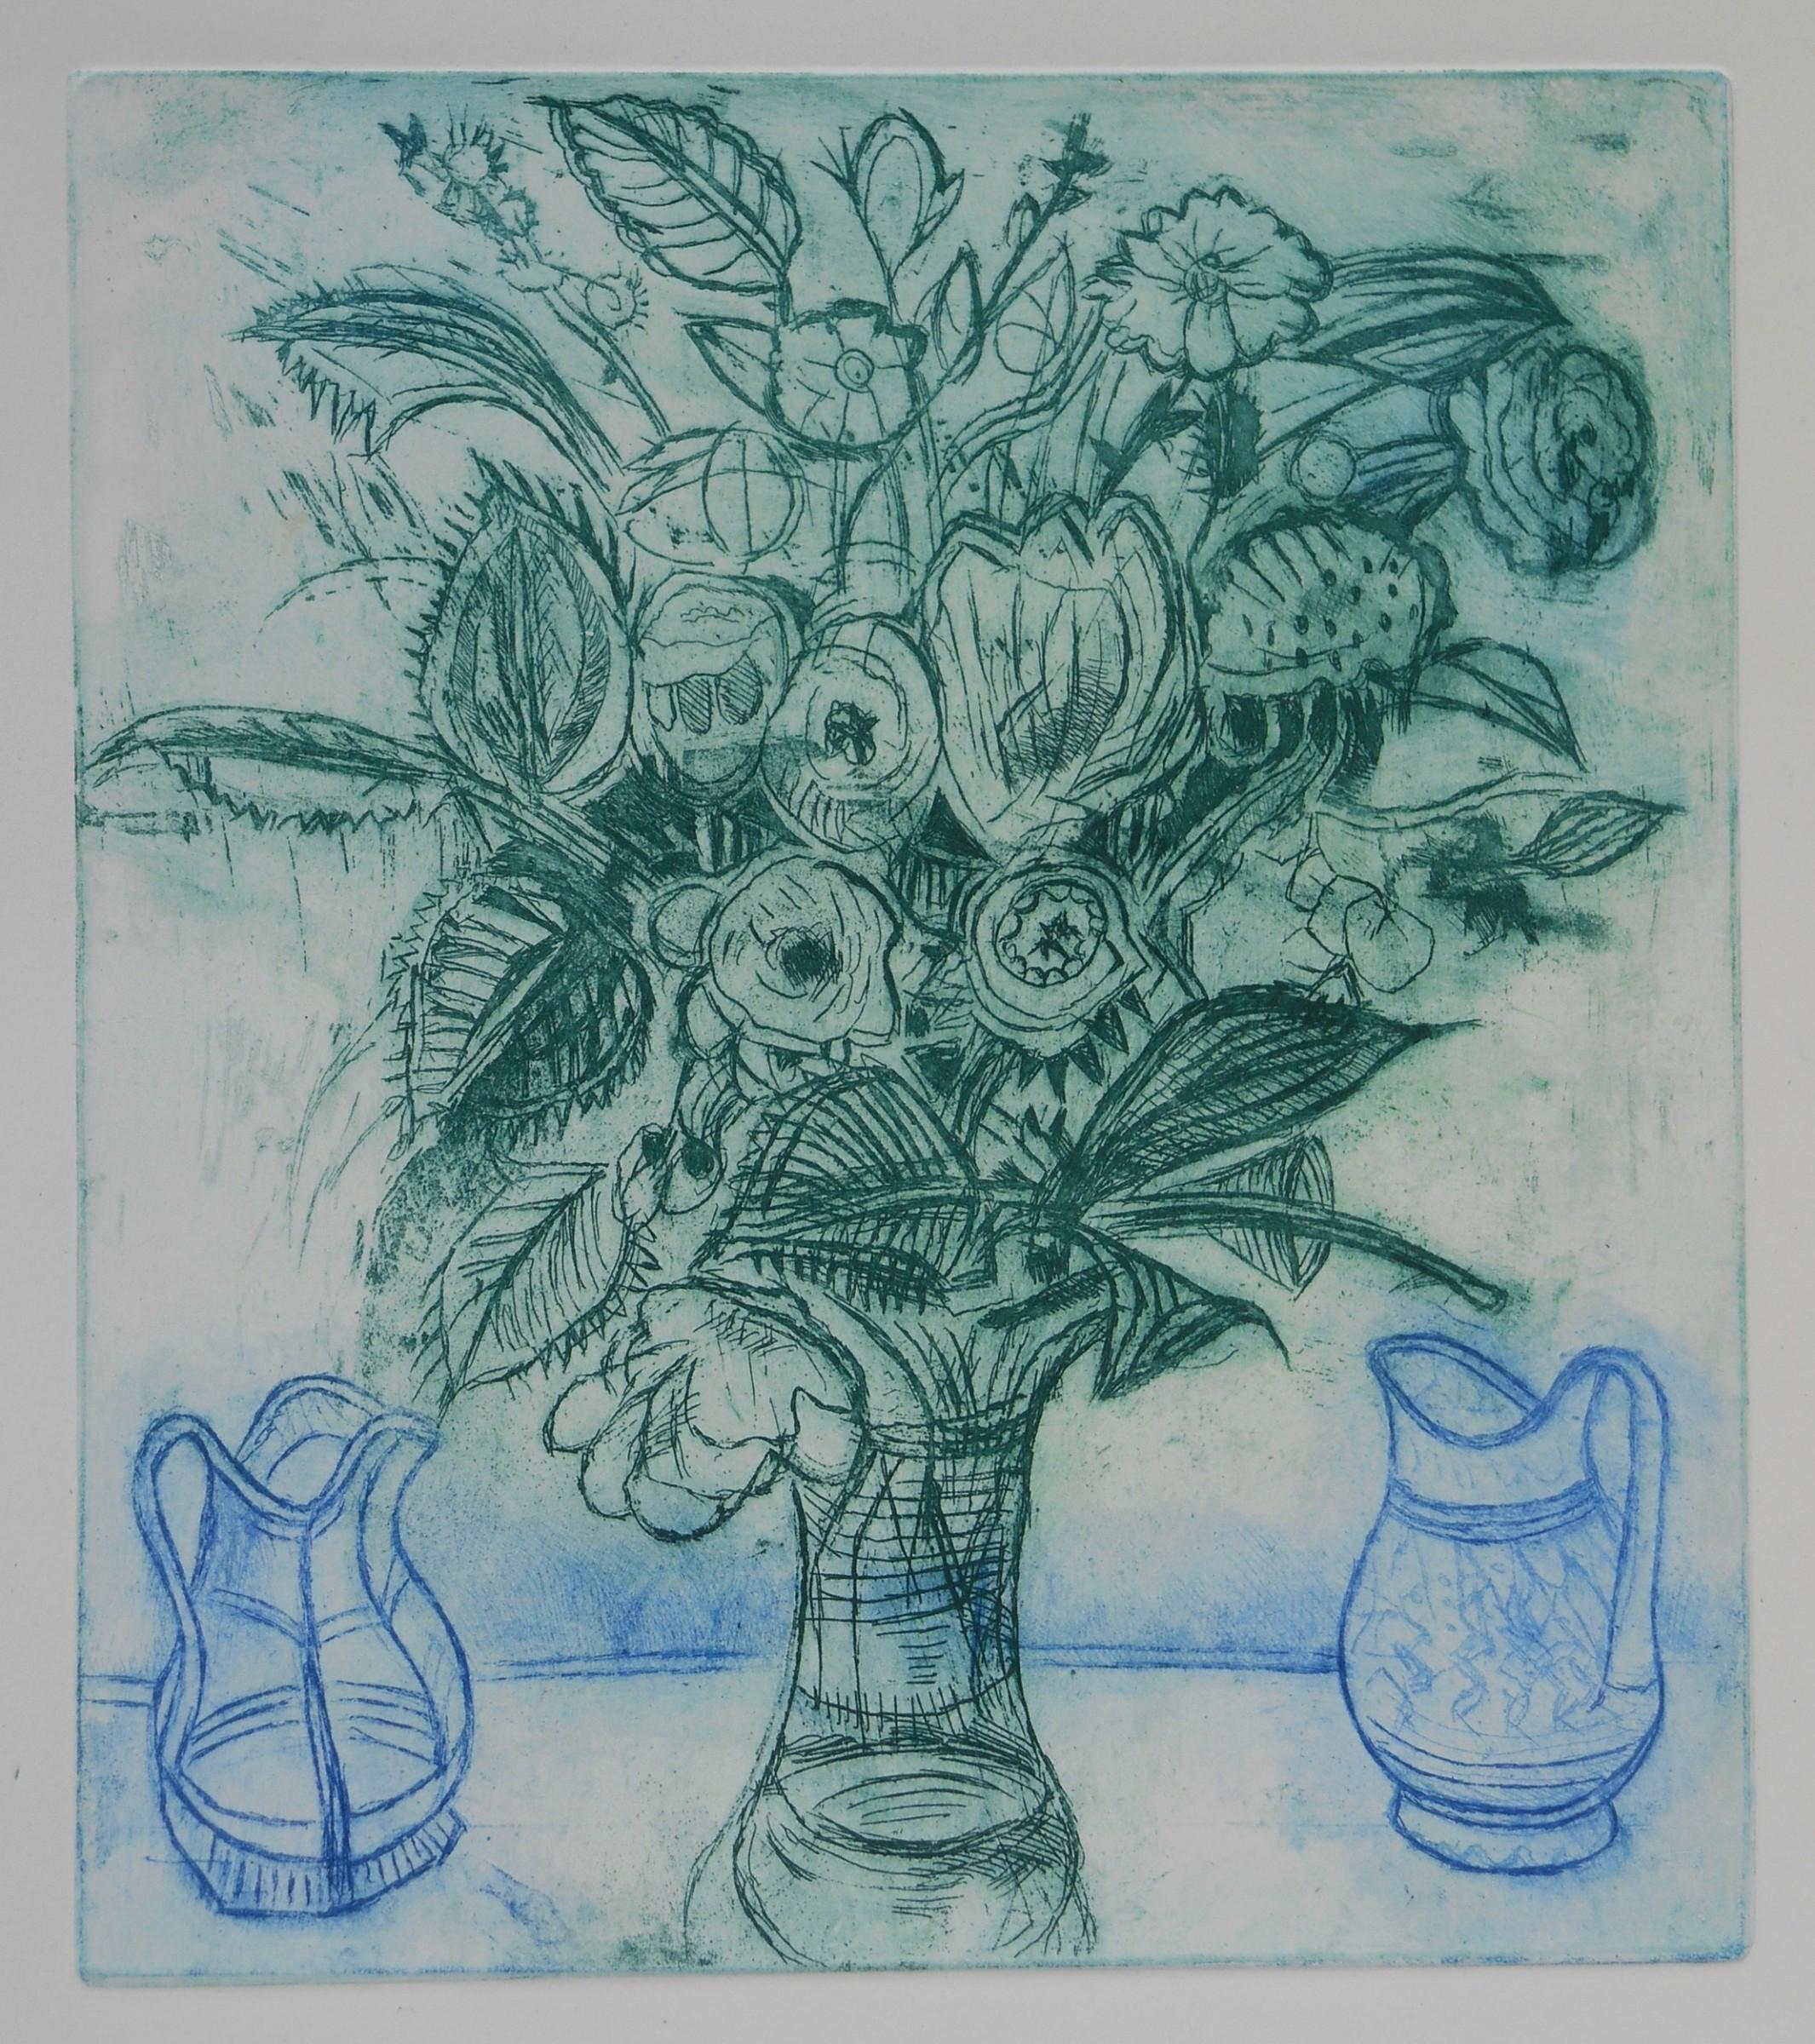 "<span class=""link fancybox-details-link""><a href=""/exhibitions/20/works/artworks_standalone10869/"">View Detail Page</a></span><div class=""artist""><span class=""artist""><strong>Richard Bawden RWS RE</strong></span></div><div class=""title""><em>Gaye's Bunch</em></div><div class=""medium"">etching</div><div class=""dimensions"">30 x 26cm image size</div><div class=""edition_details"">edition of 85</div>"